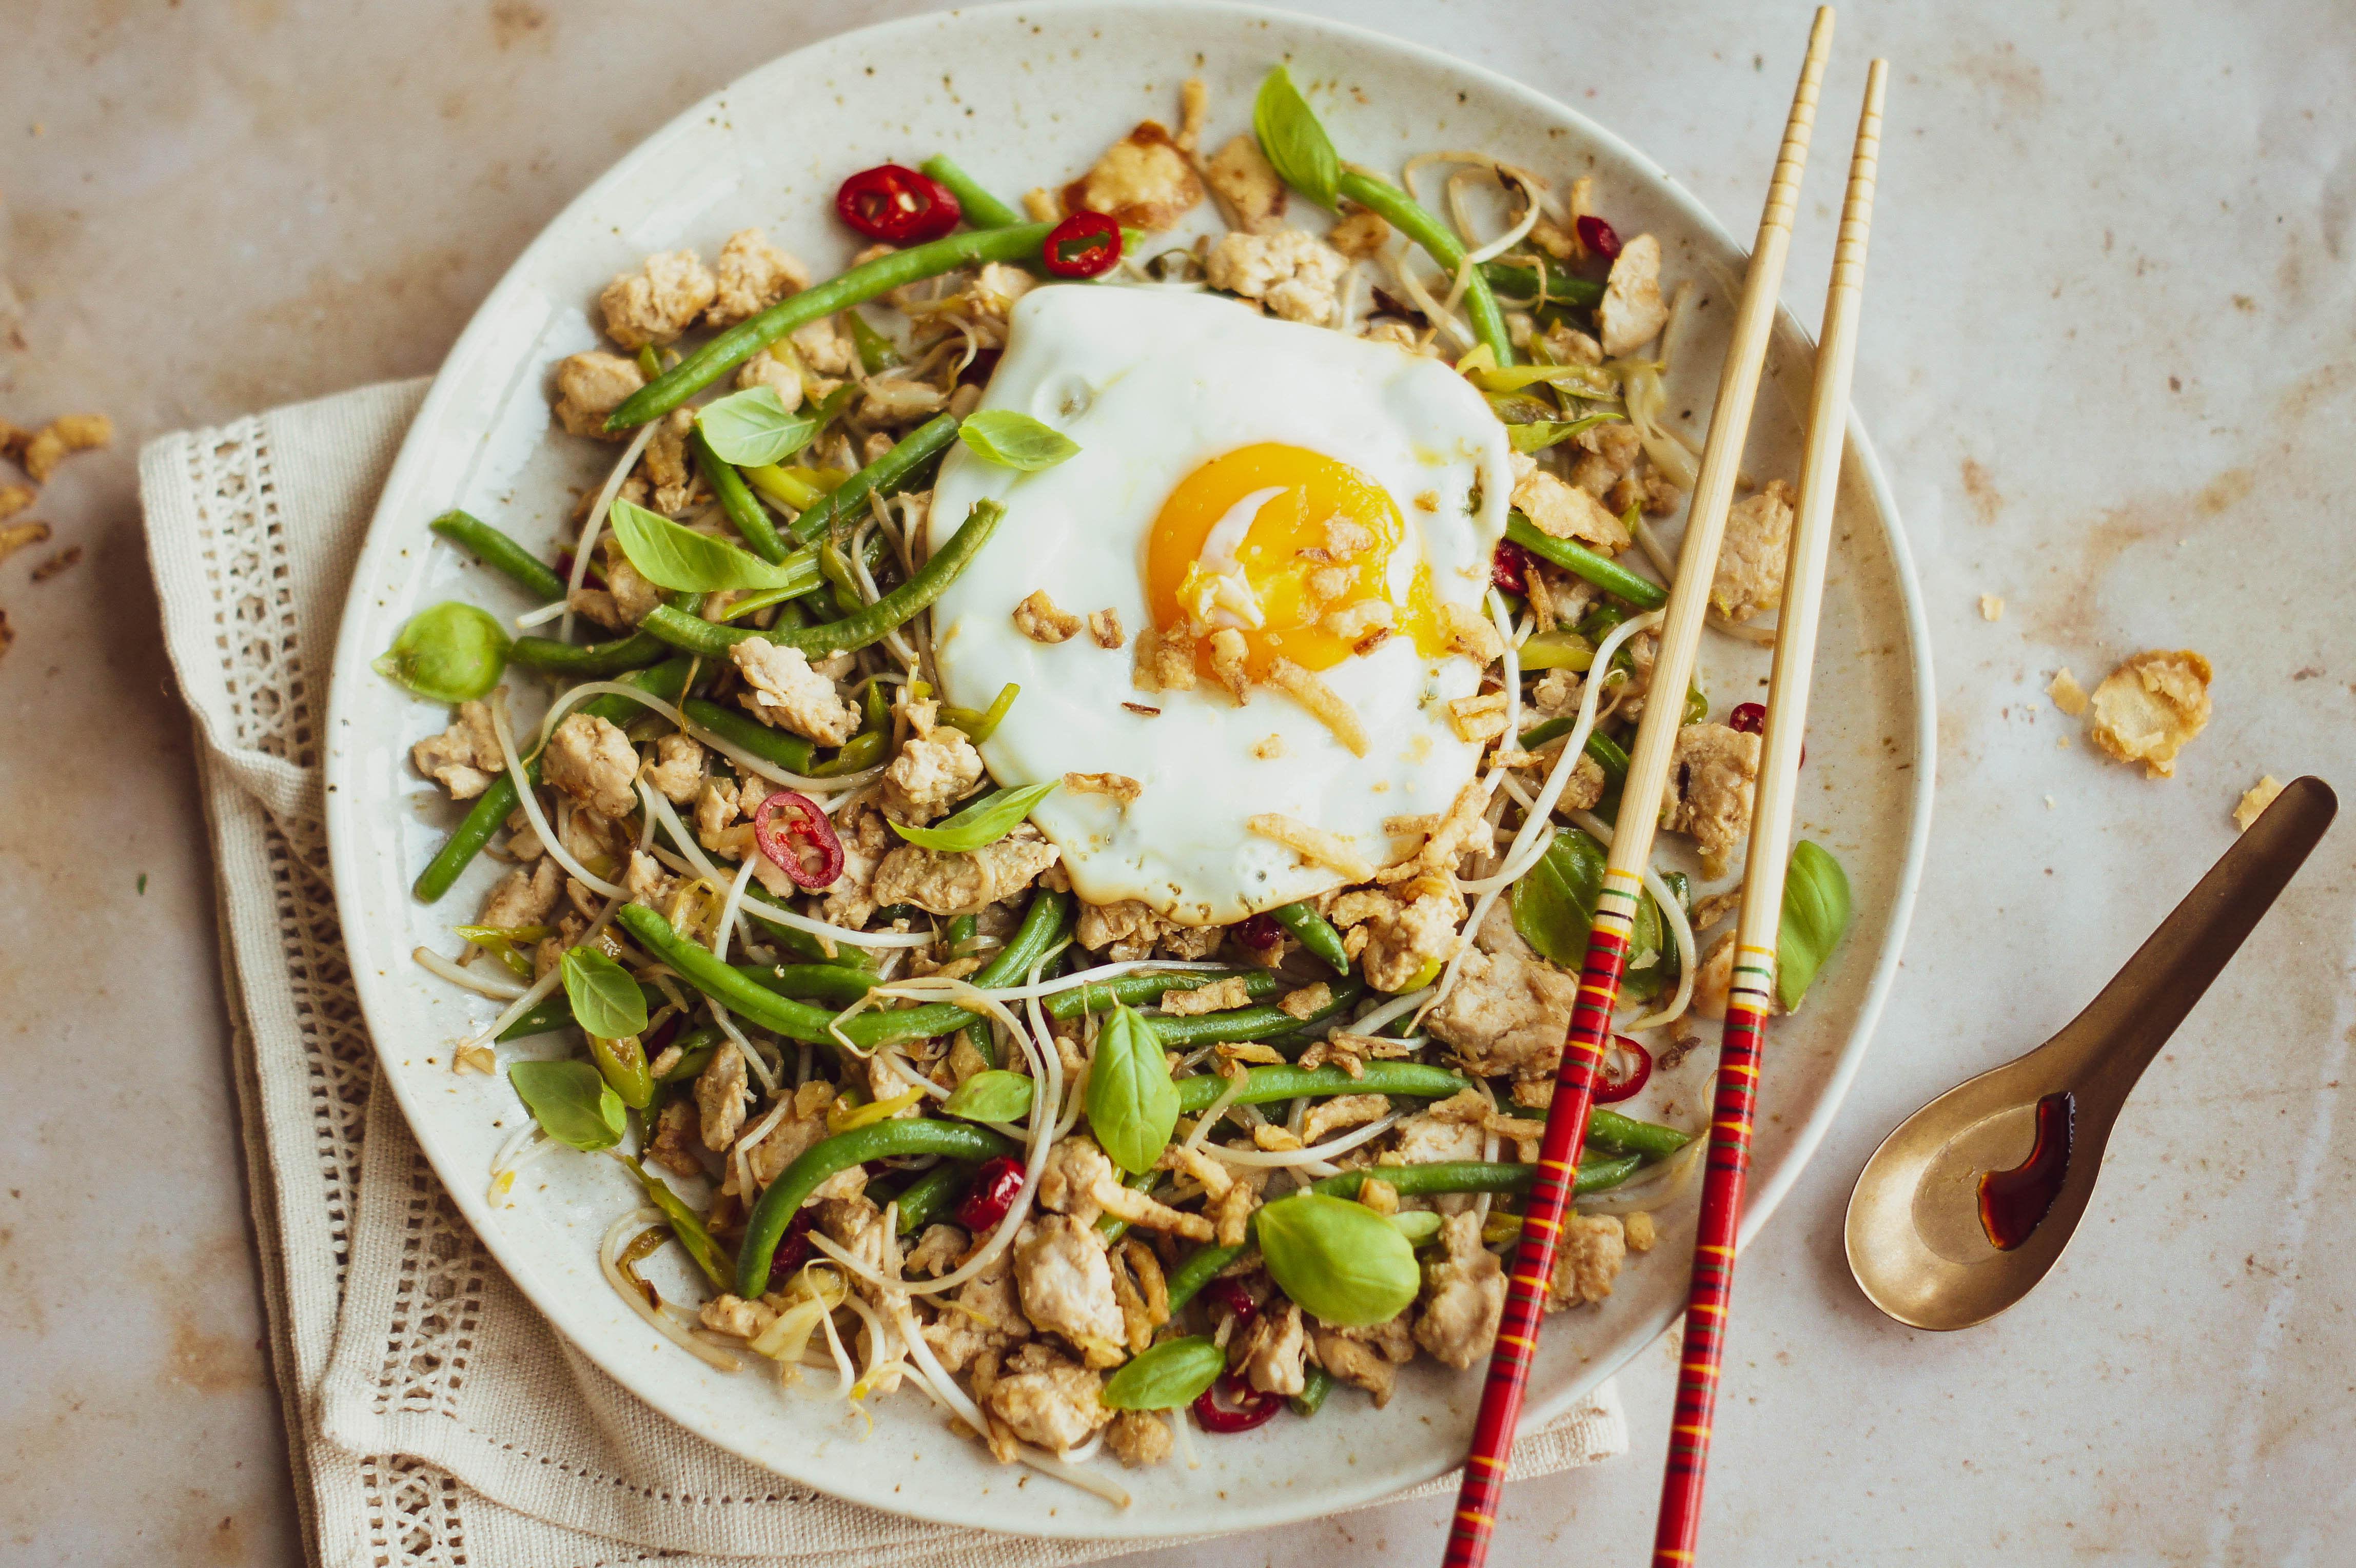 Thai Chicken Mince Stir-fry with Basil